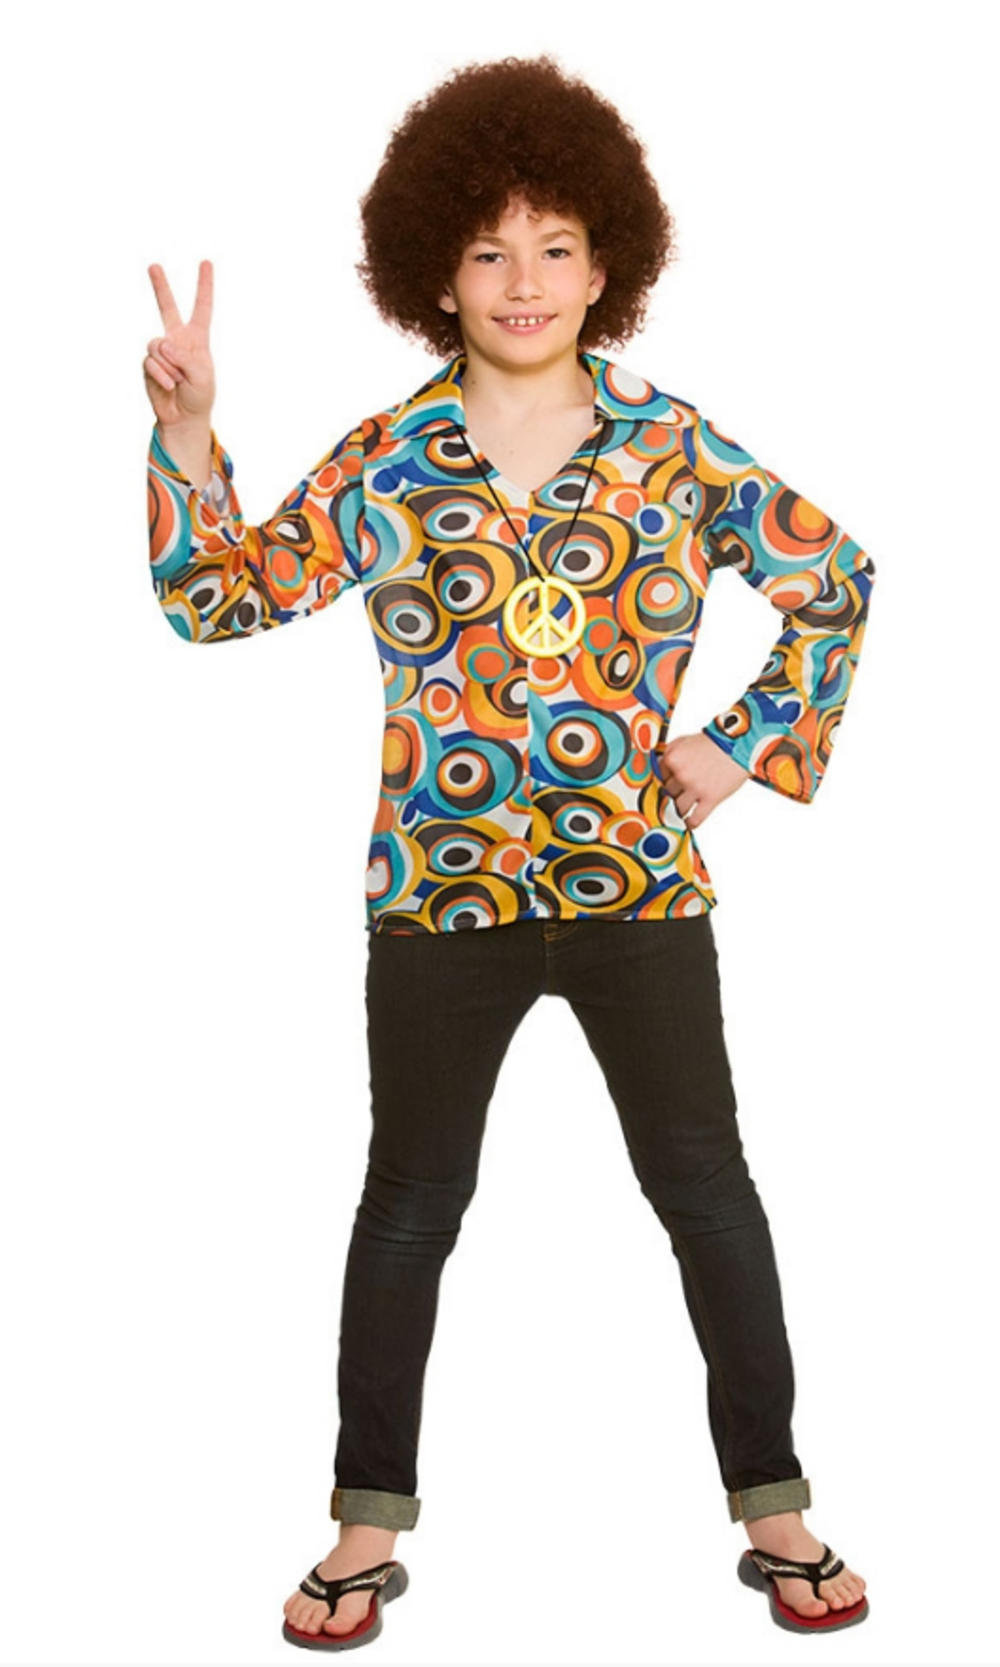 Retro Hippie Shirt Kids Accessory